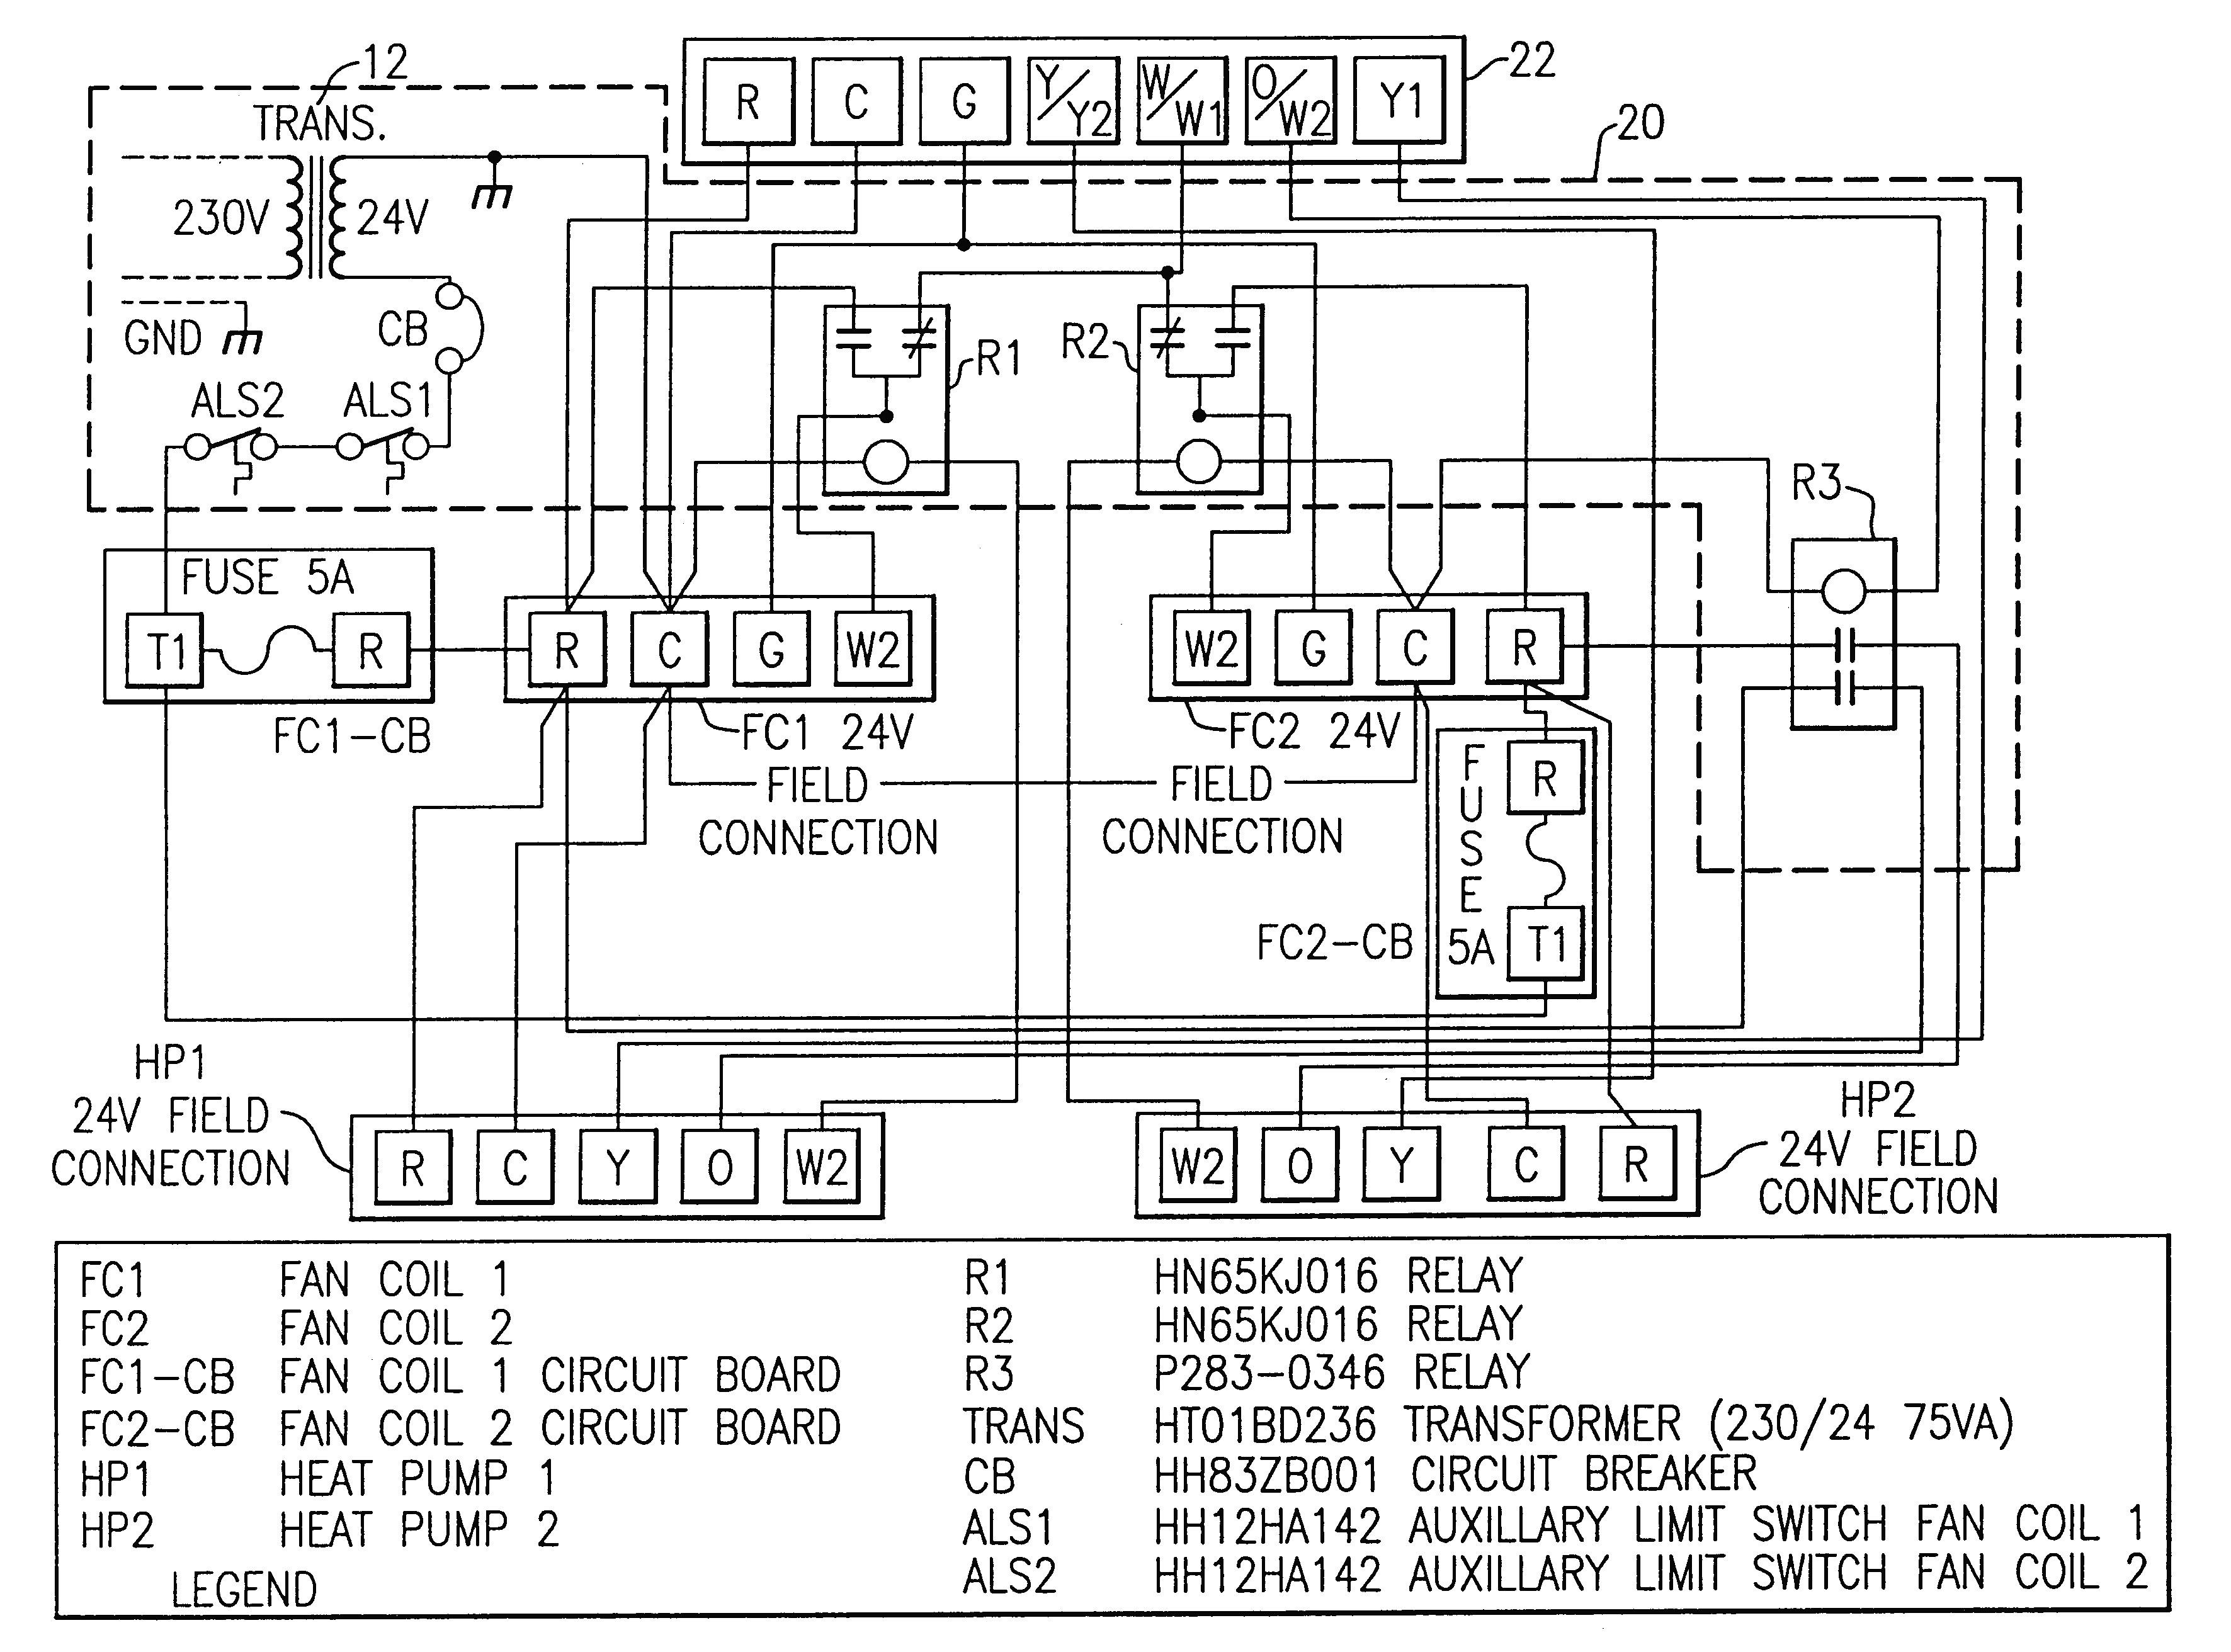 wiring diagram for goodman package ac unit wiring diagram splitwiring diagram for goodman package ac unit